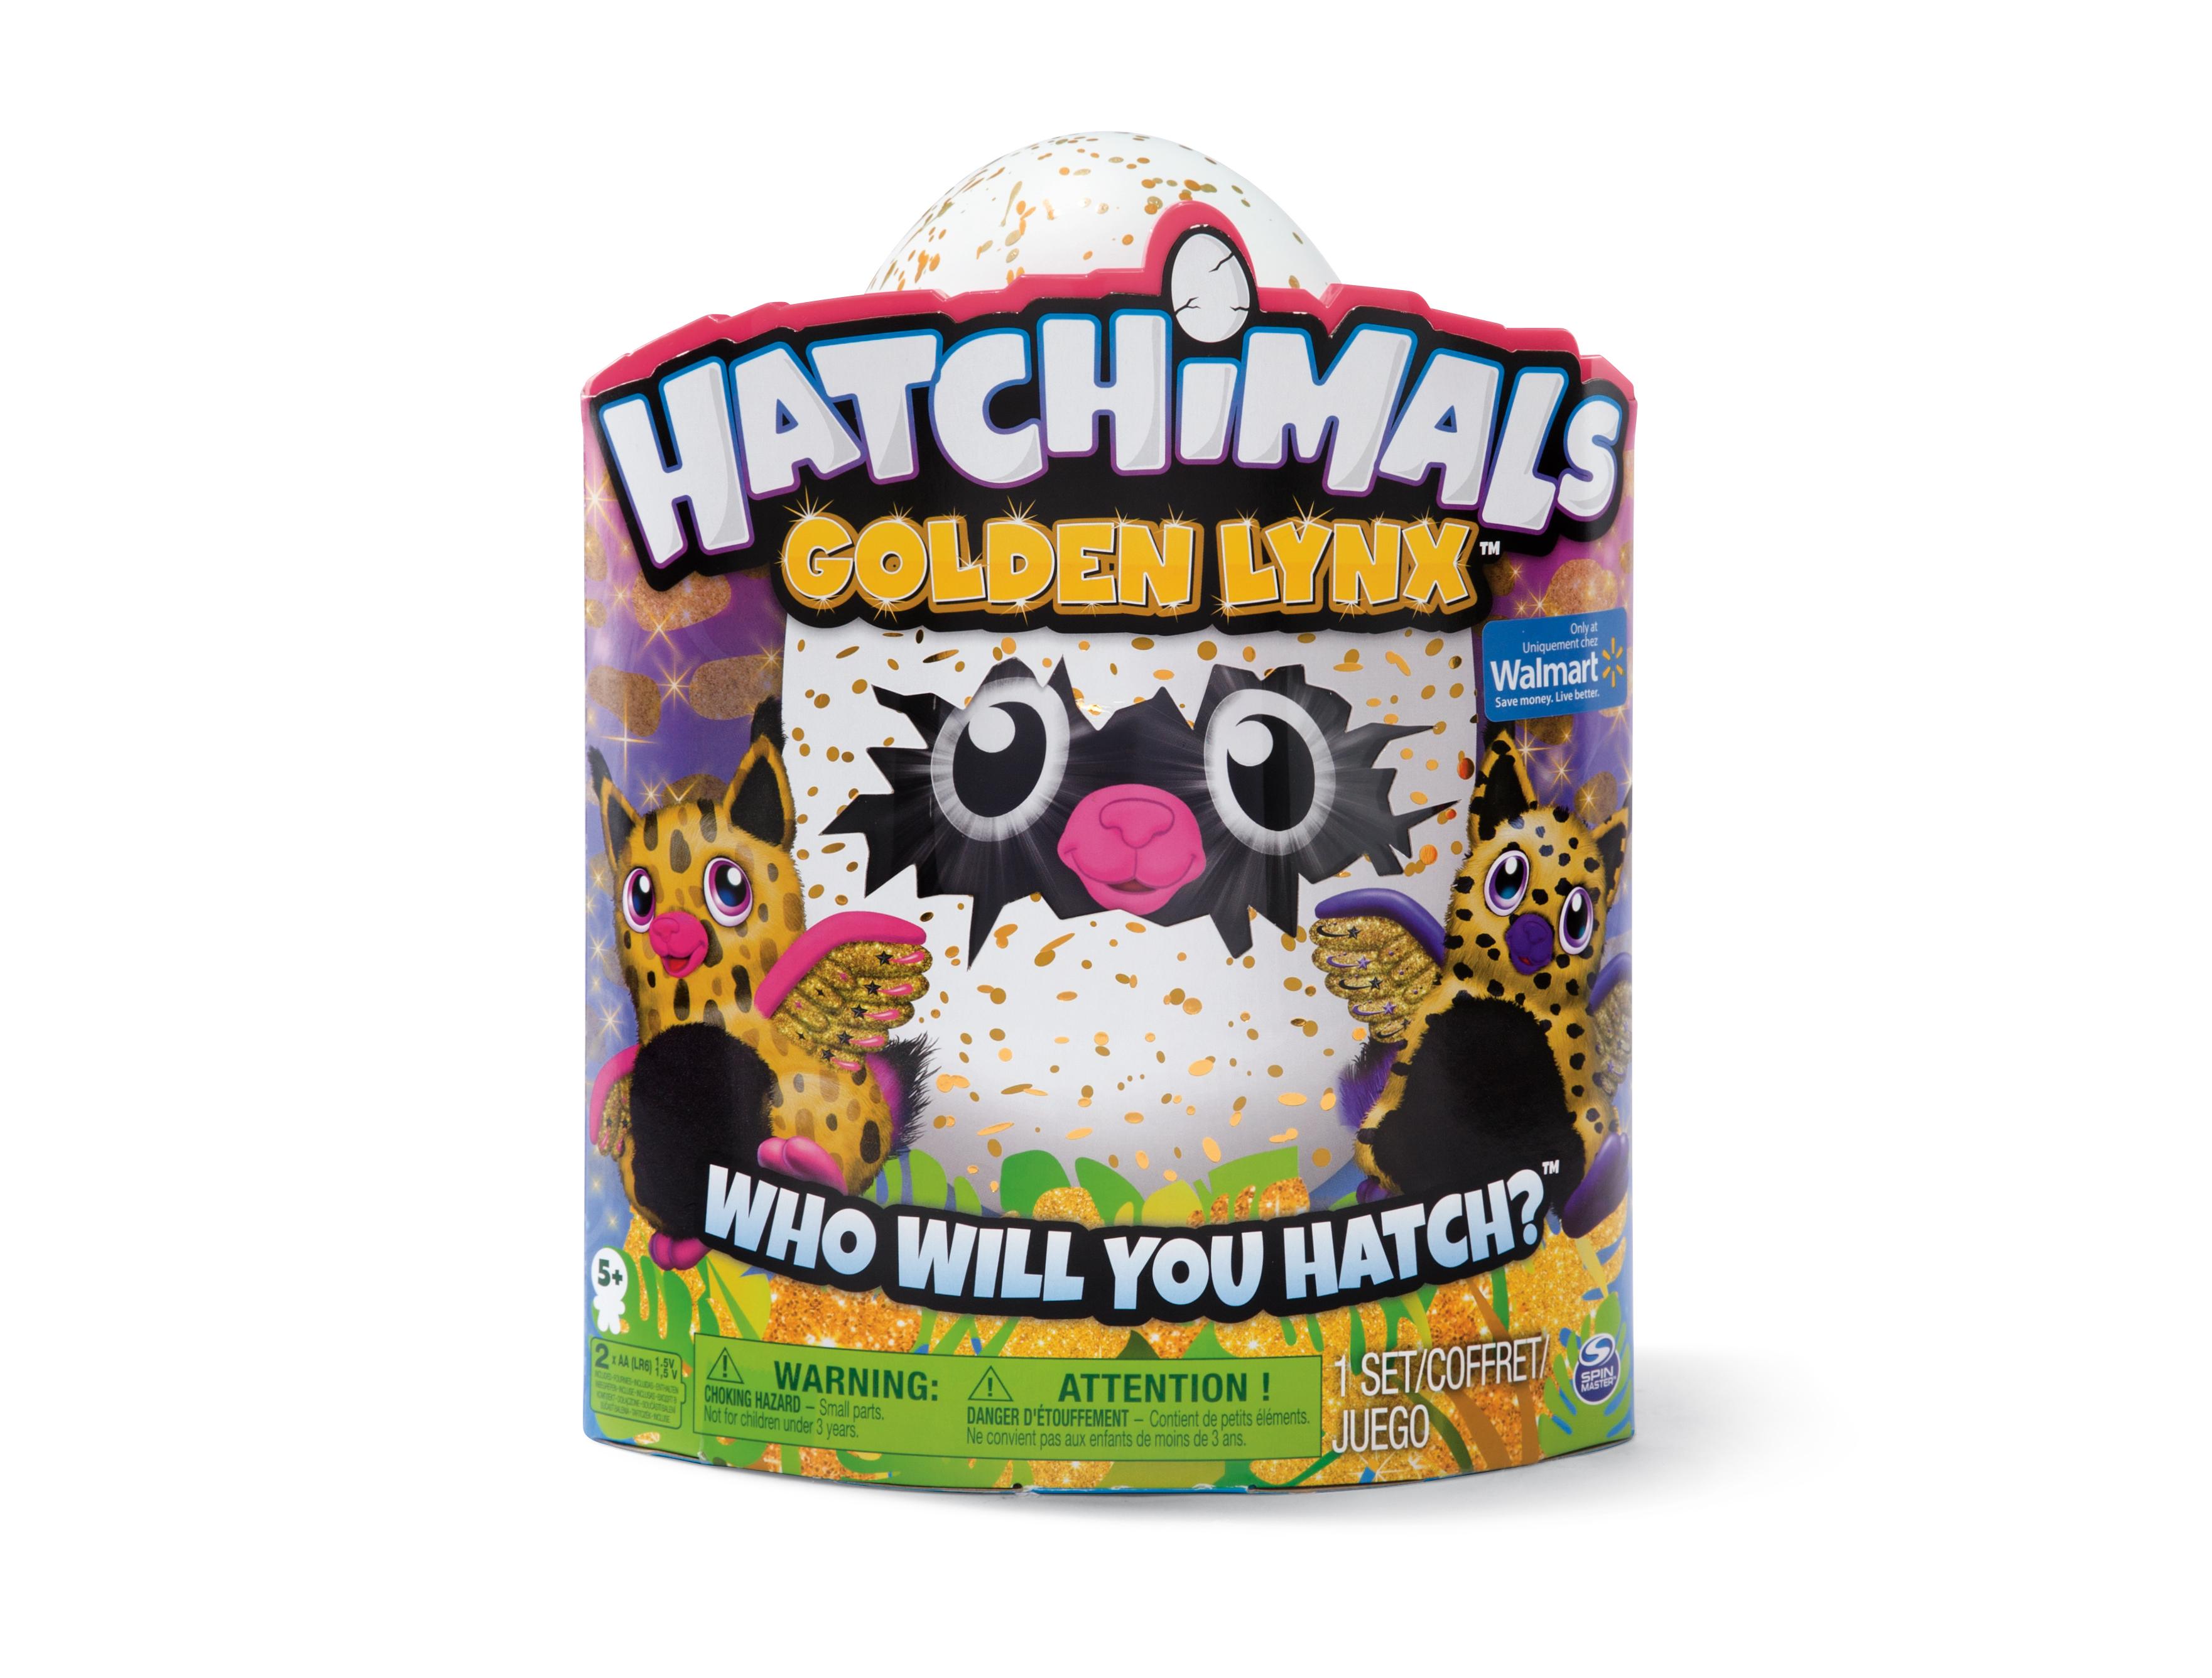 The new Hatchimals Golden Lynx, a Walmart exclusive.